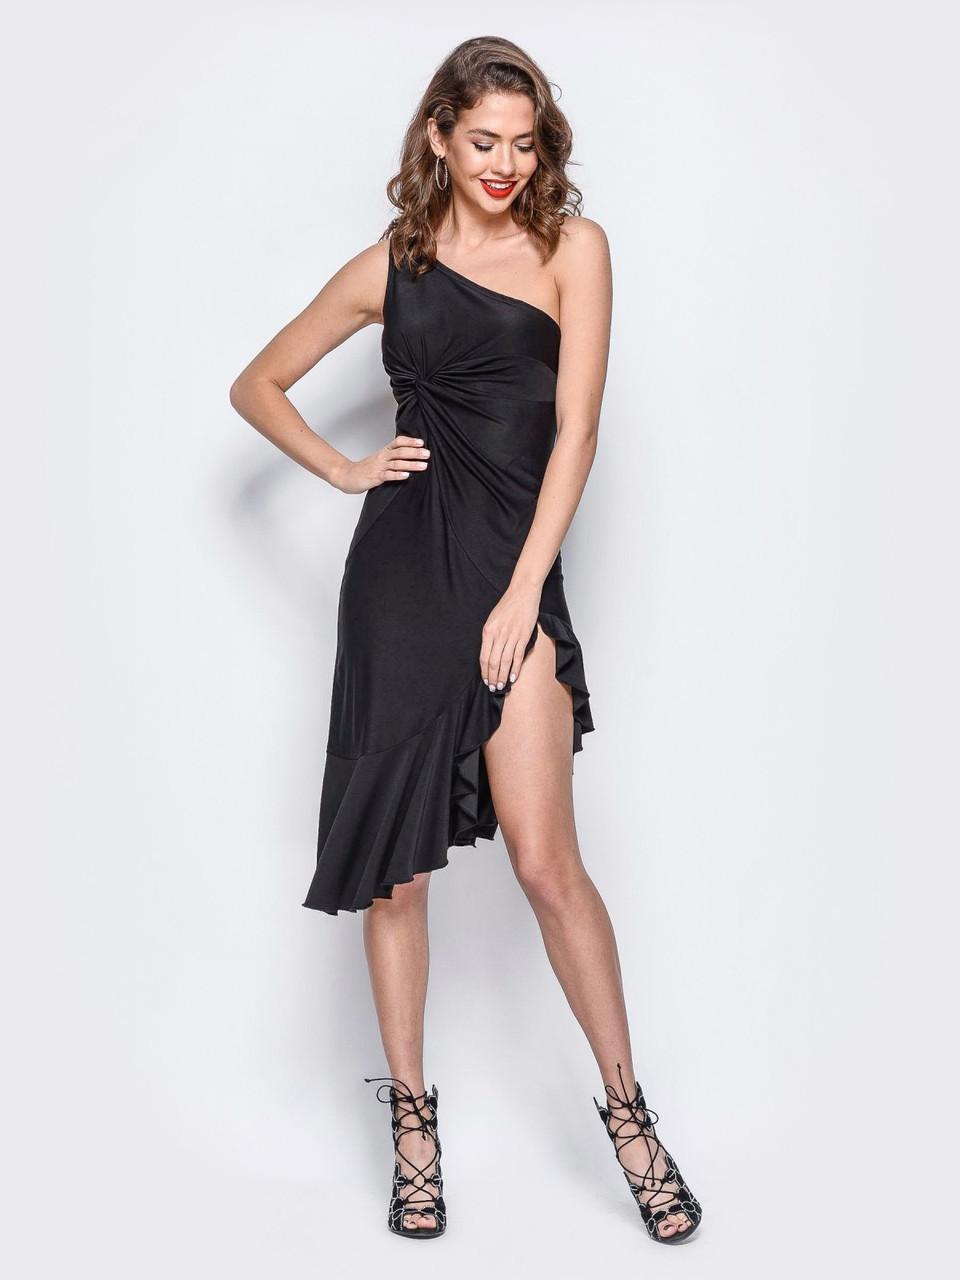 58e8b78e2acb55b ⭕️Вечернее черное платье с бретелей на одно плечо (с разрезом, с воланом)